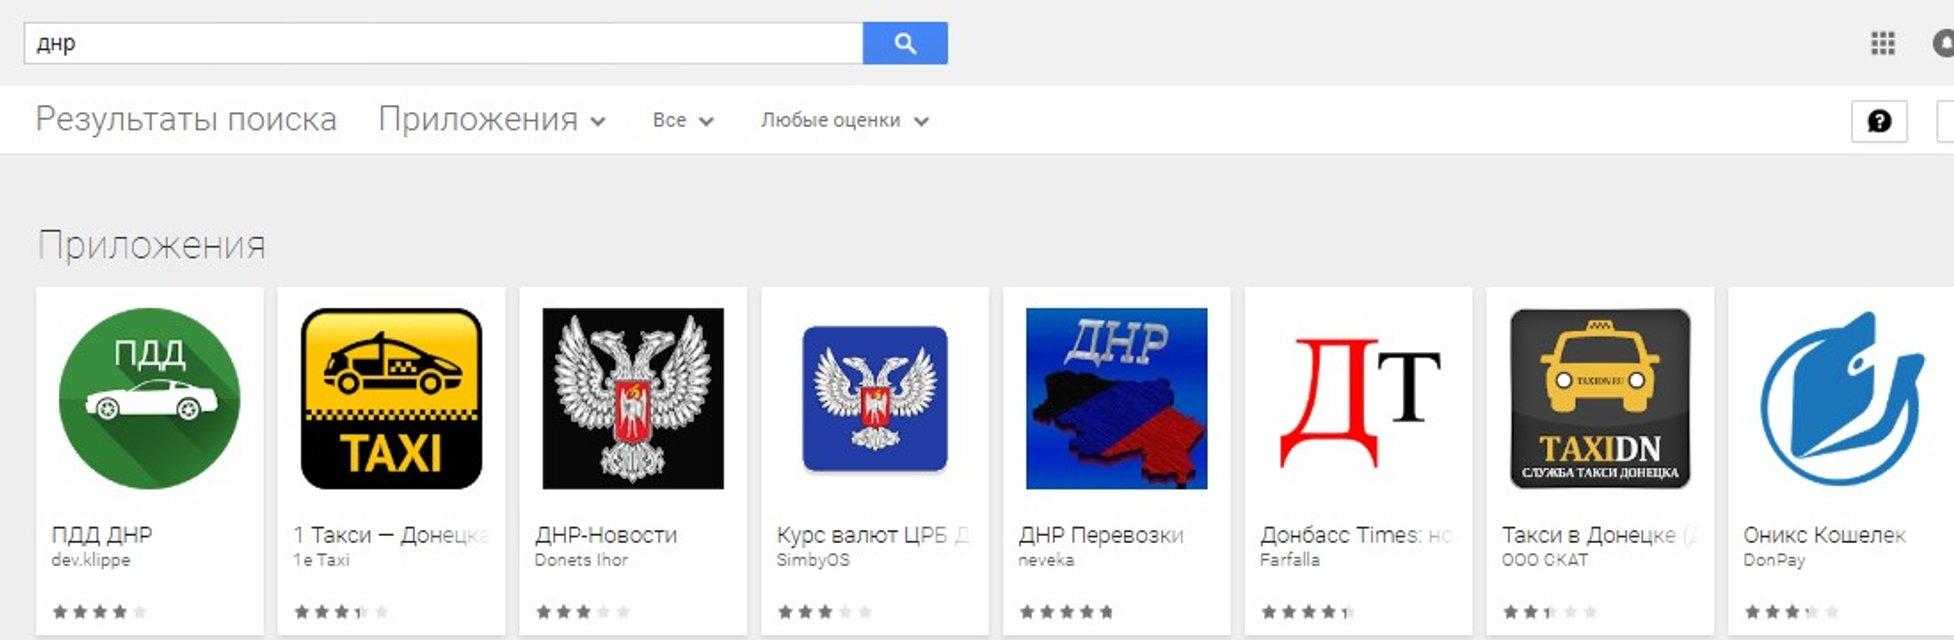 Гугл помогает террористам: в Google Play залили множество приложений для 'ДНР' и 'ЛНР' - фото 170954